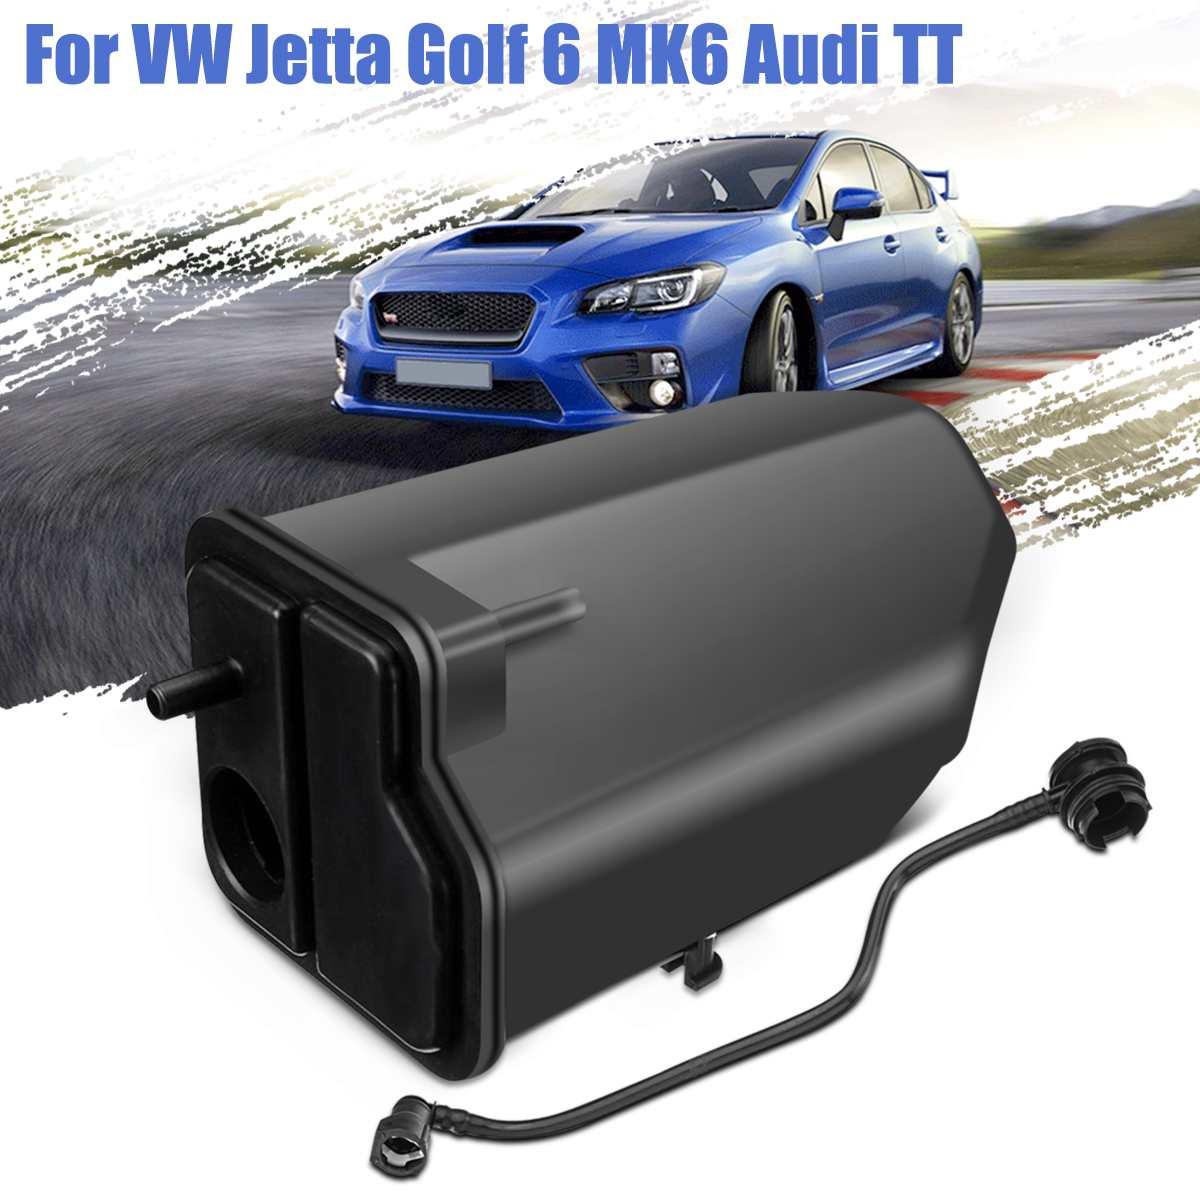 1k0201897ae 1k0201801e 아우디 a3 tt 용 vw/제타 골프 eos 용 자동차 활성탄 숯 용기 캔